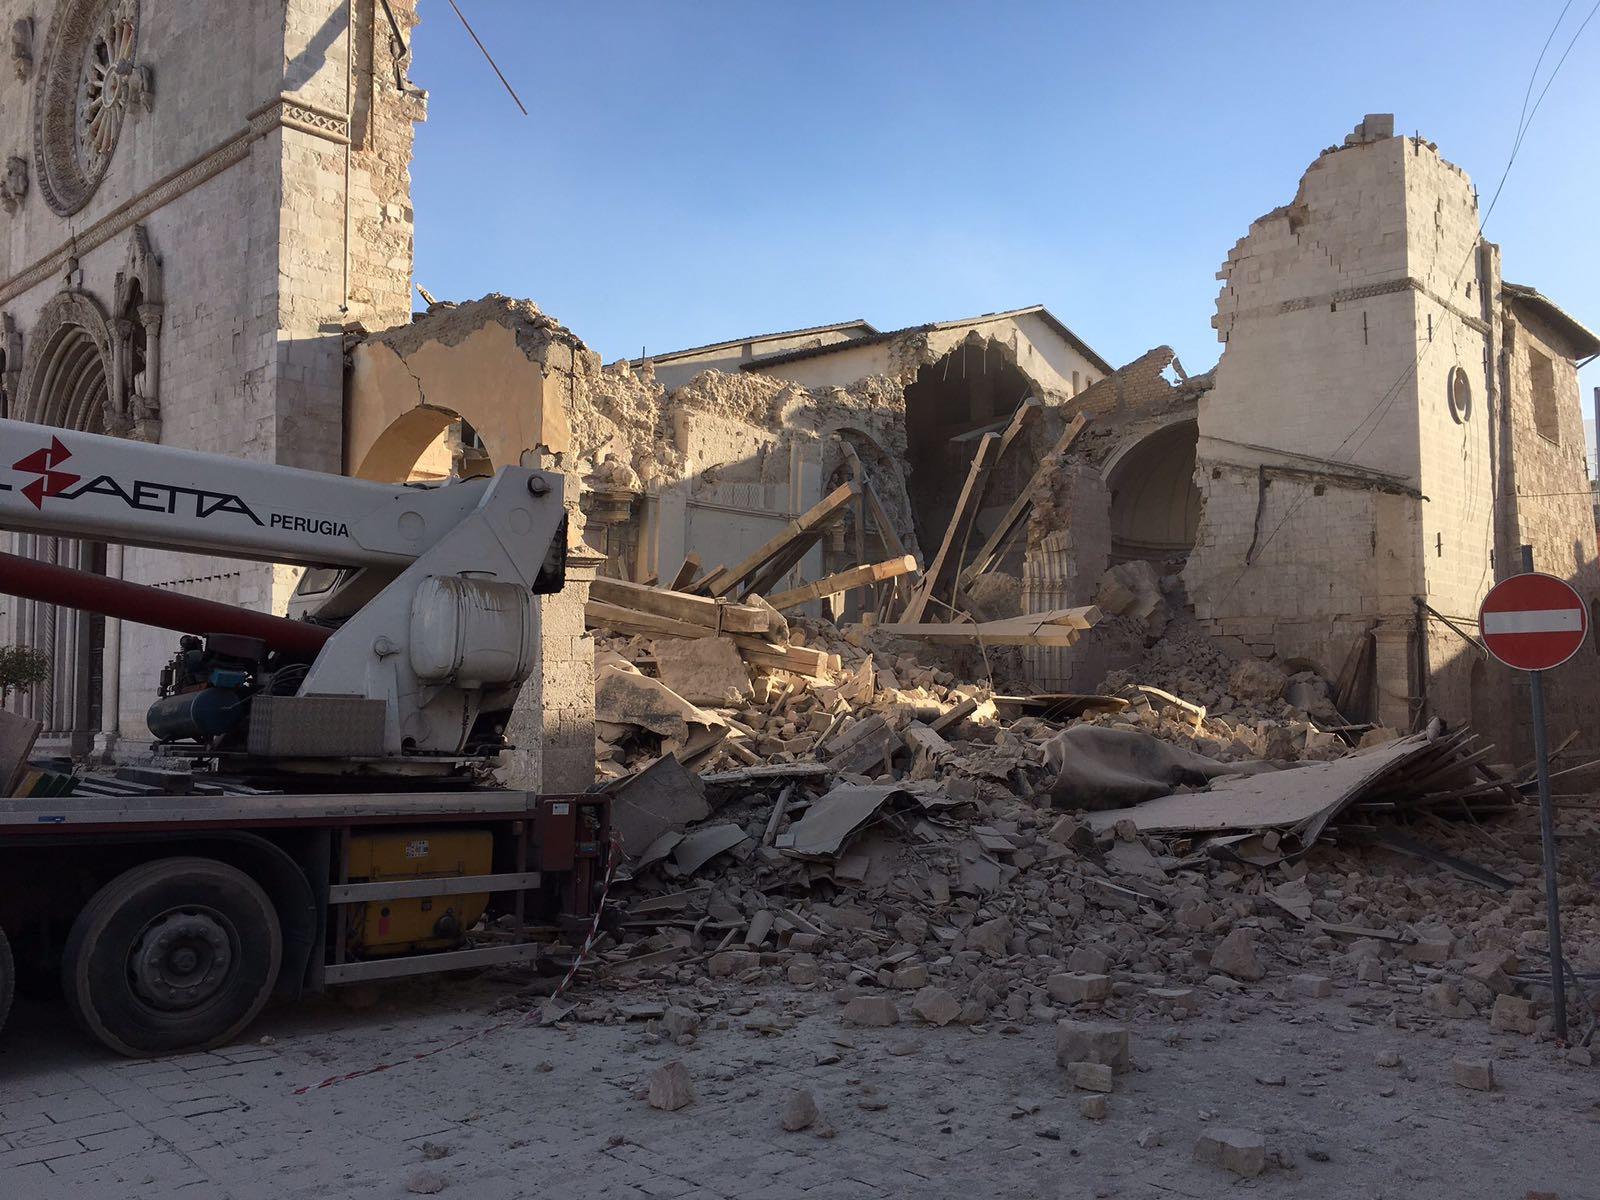 Terremoto, vento forte spazza via tende terremotati